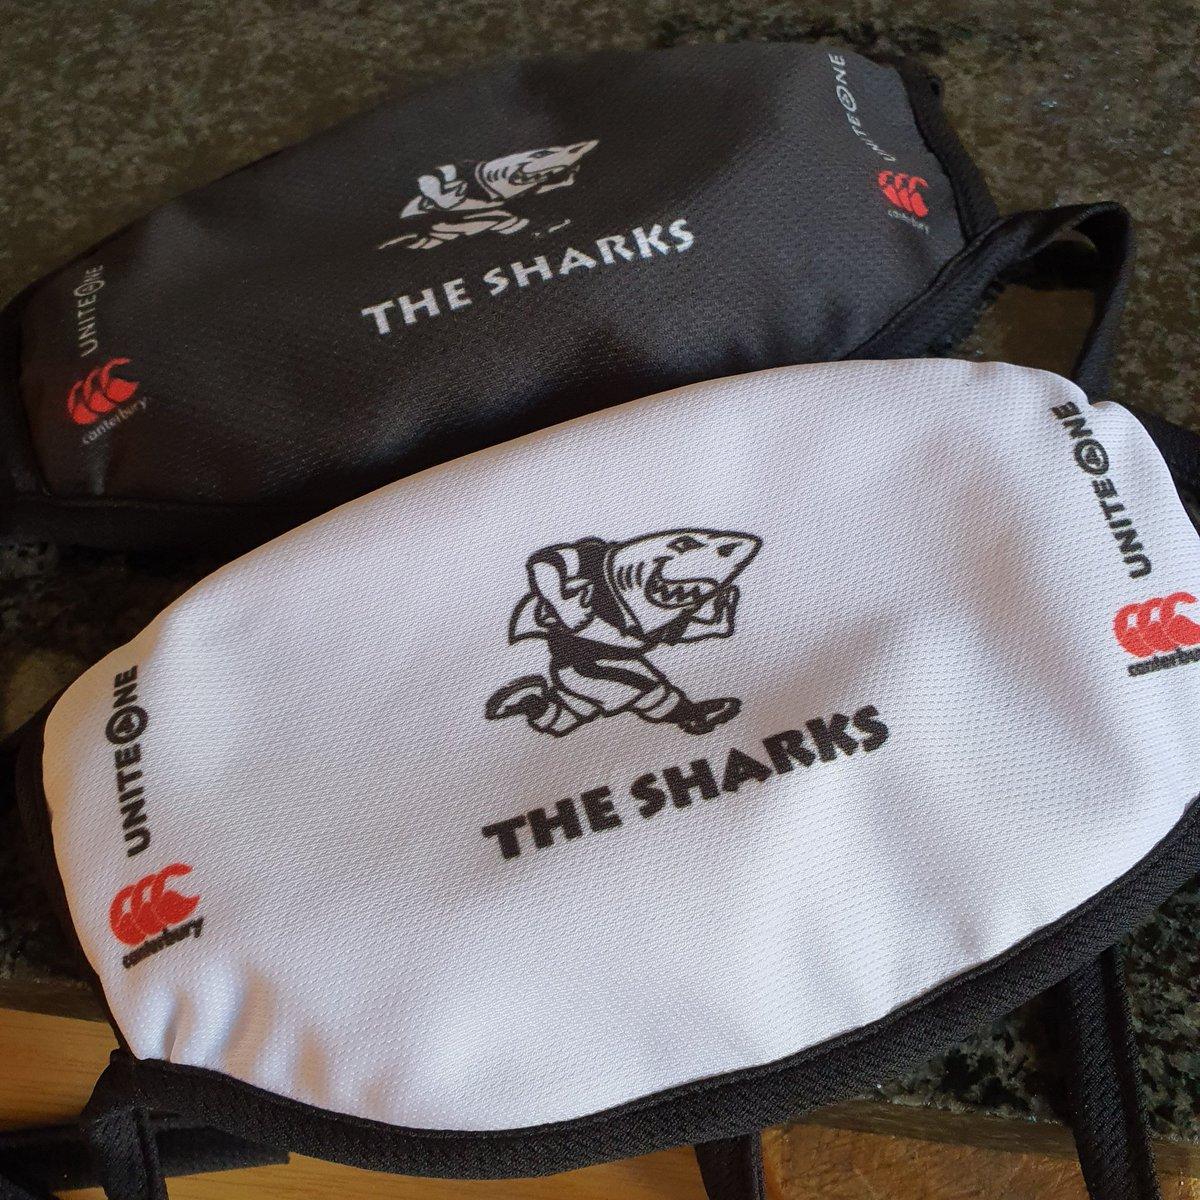 Finally got my @TheSharksZA #unite4one  @CanterburySA masks  #SouthCoastRoadTrip #ShellyBeach  #Maritzburre #Sharkie  #OurSharksForeverpic.twitter.com/2p1giKGq3s